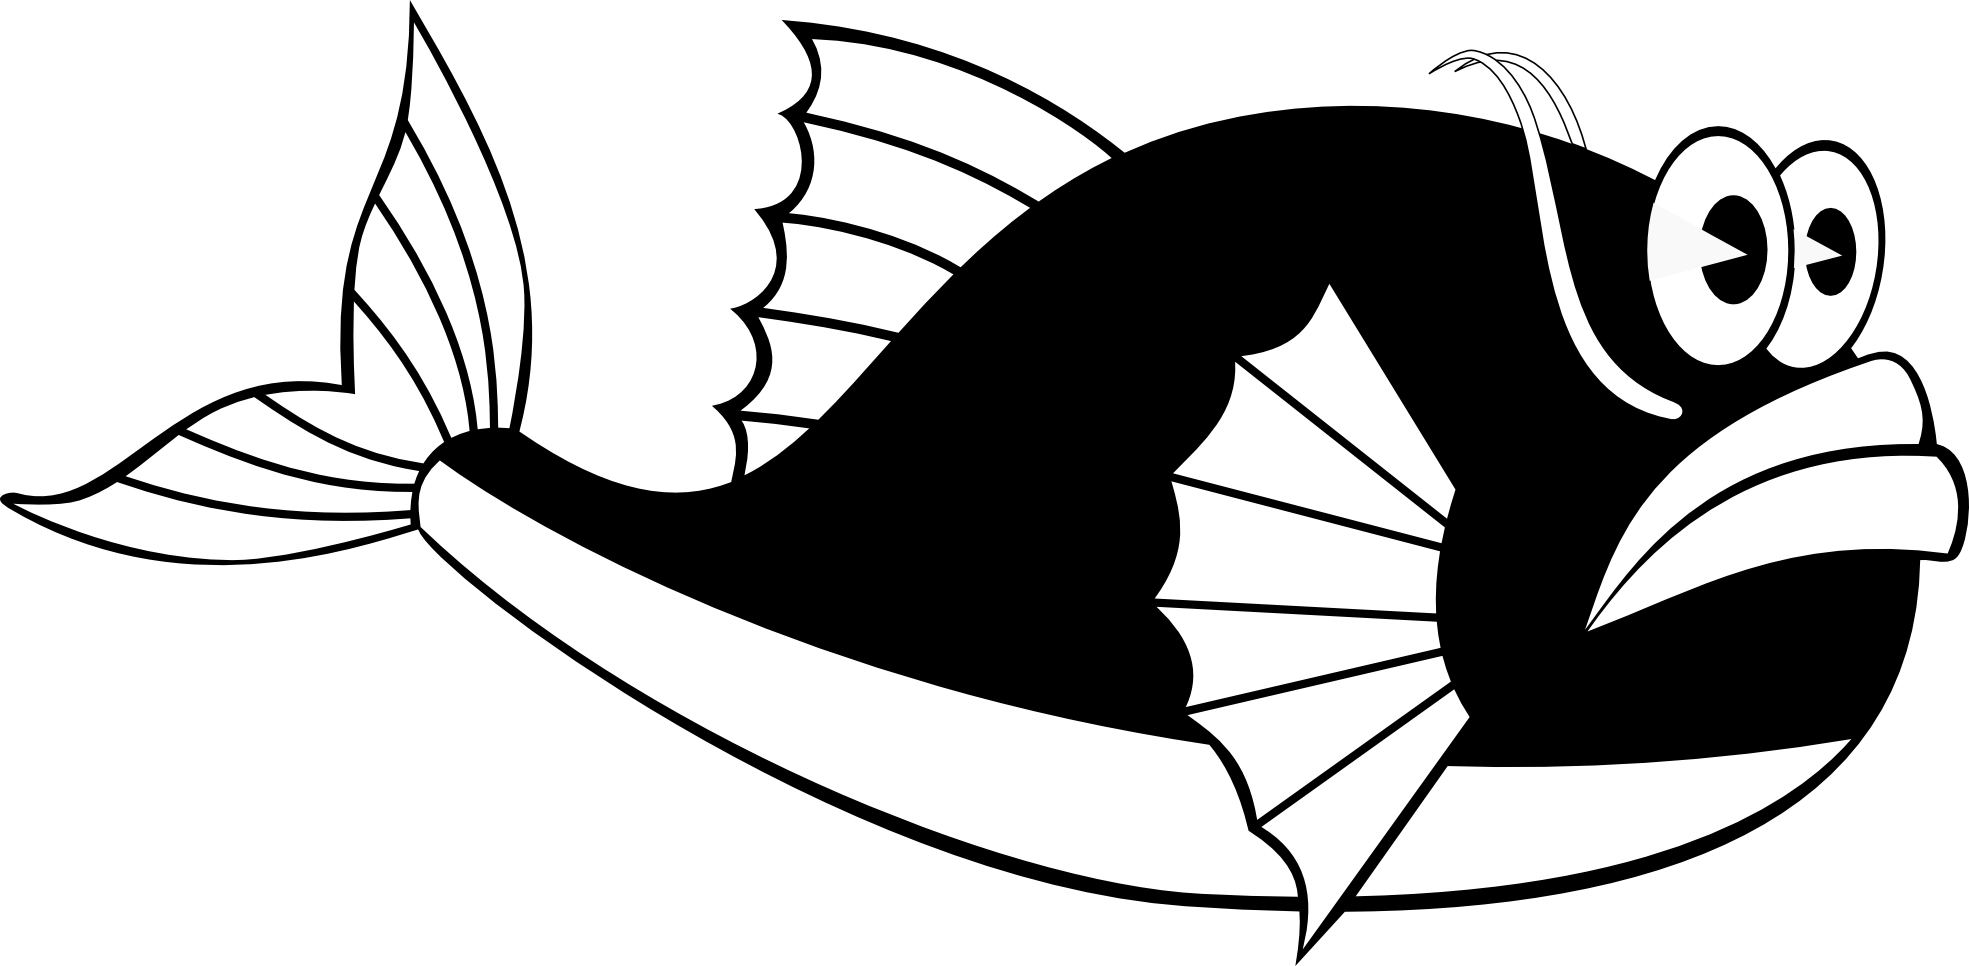 Clipart whale shape. Clip art black and